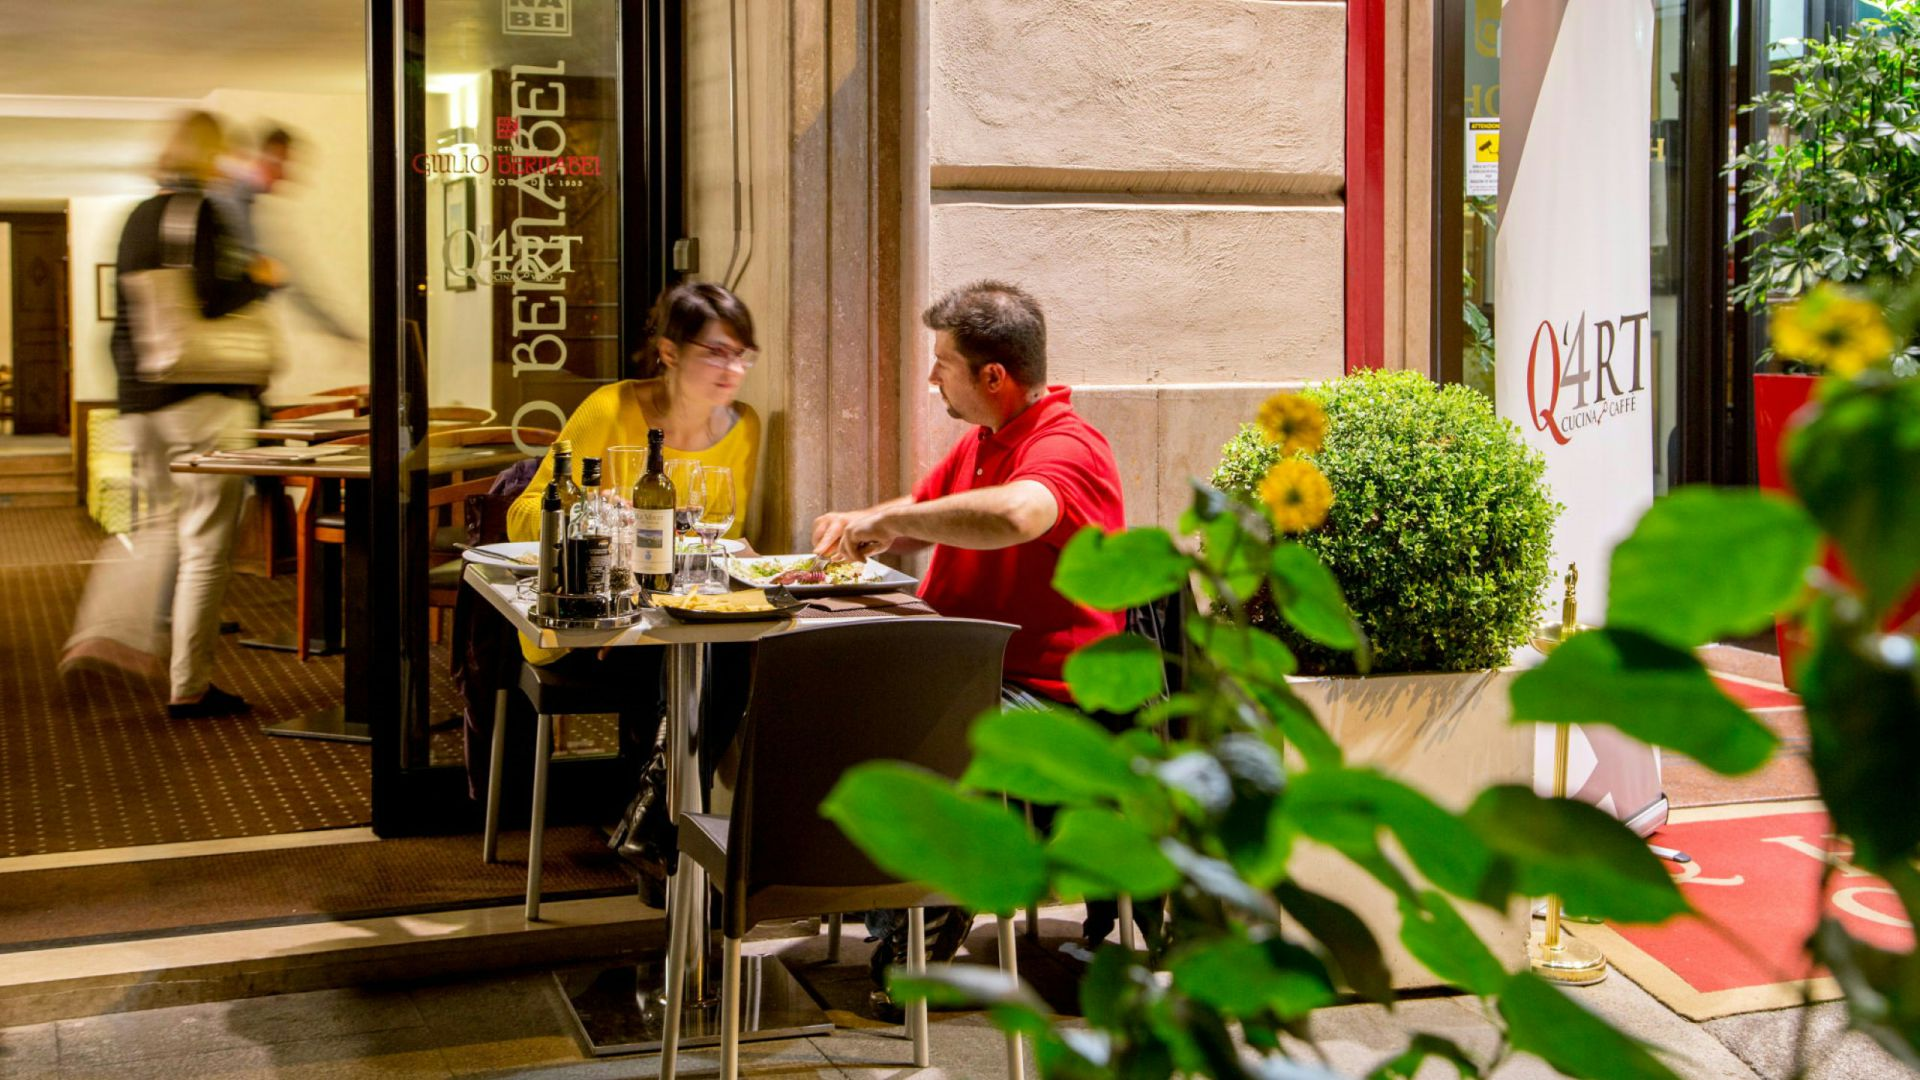 Foto-Hotel-Oxford-Roma-bar-de-vinhos-3